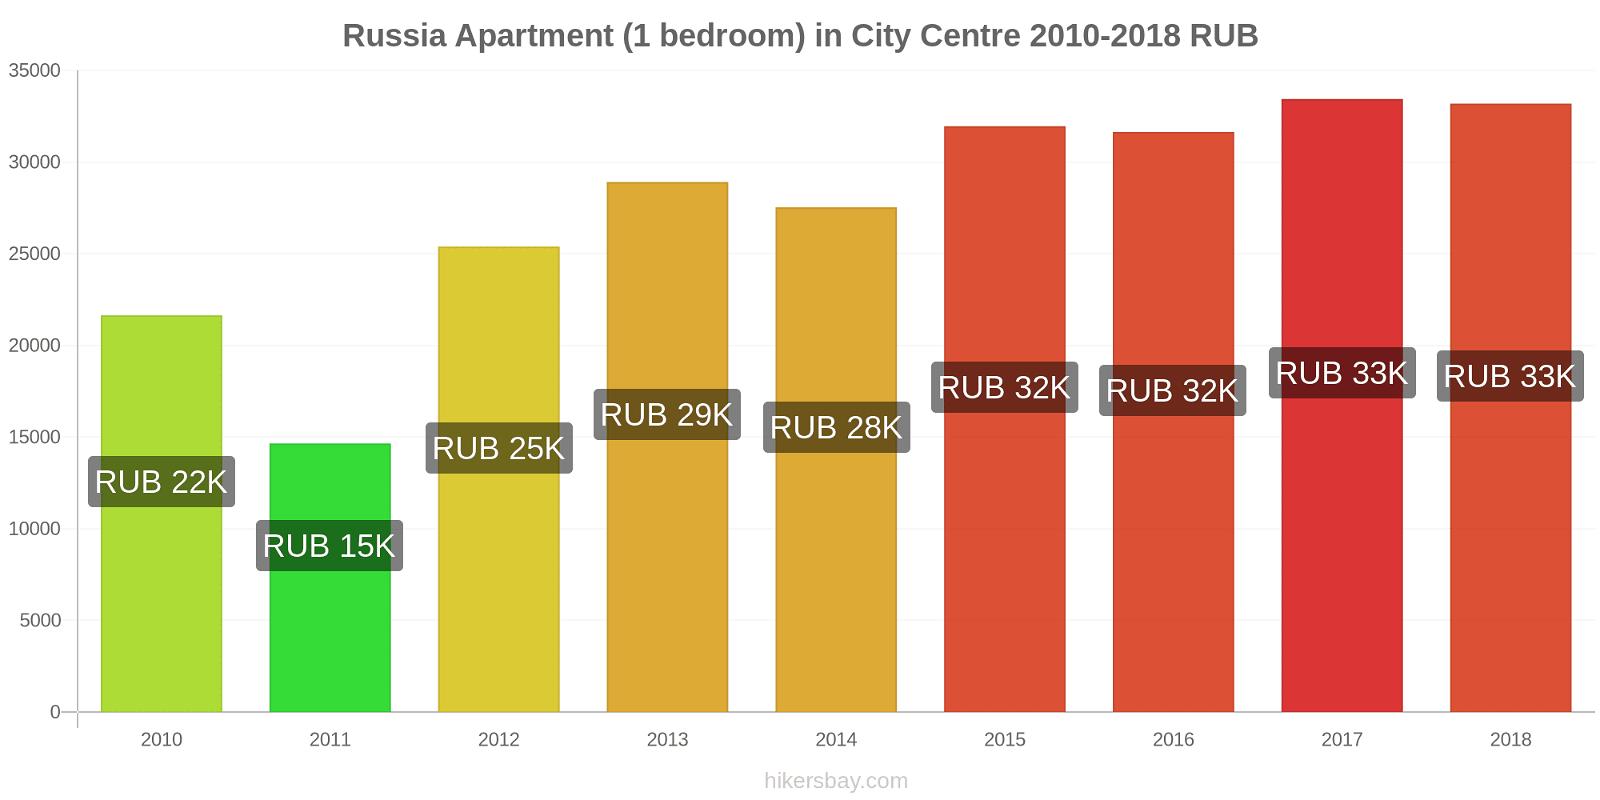 Russia price changes Apartment (1 bedroom) in City Centre hikersbay.com